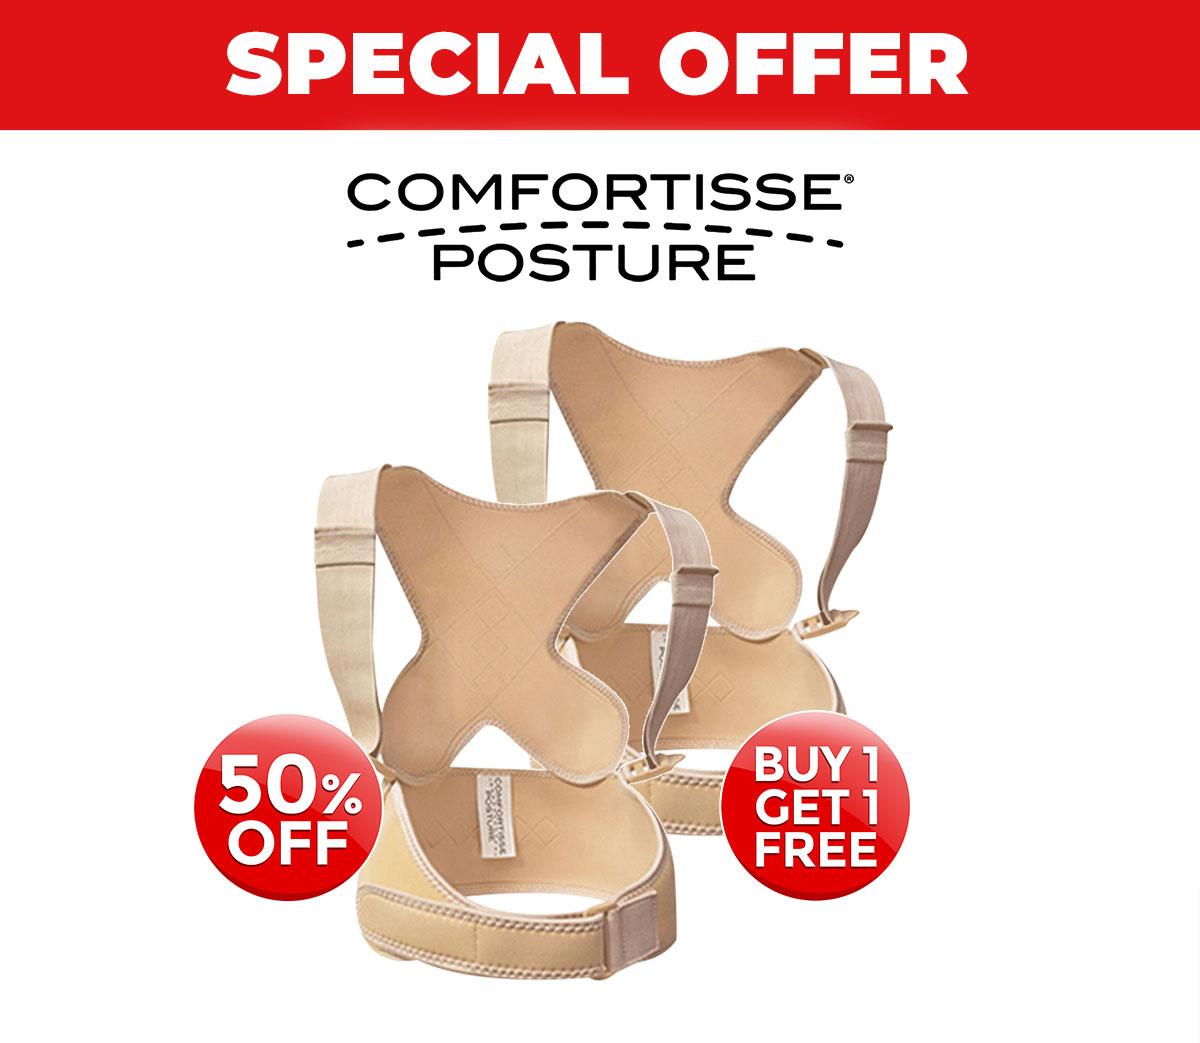 comfortisse-posture-special-offer